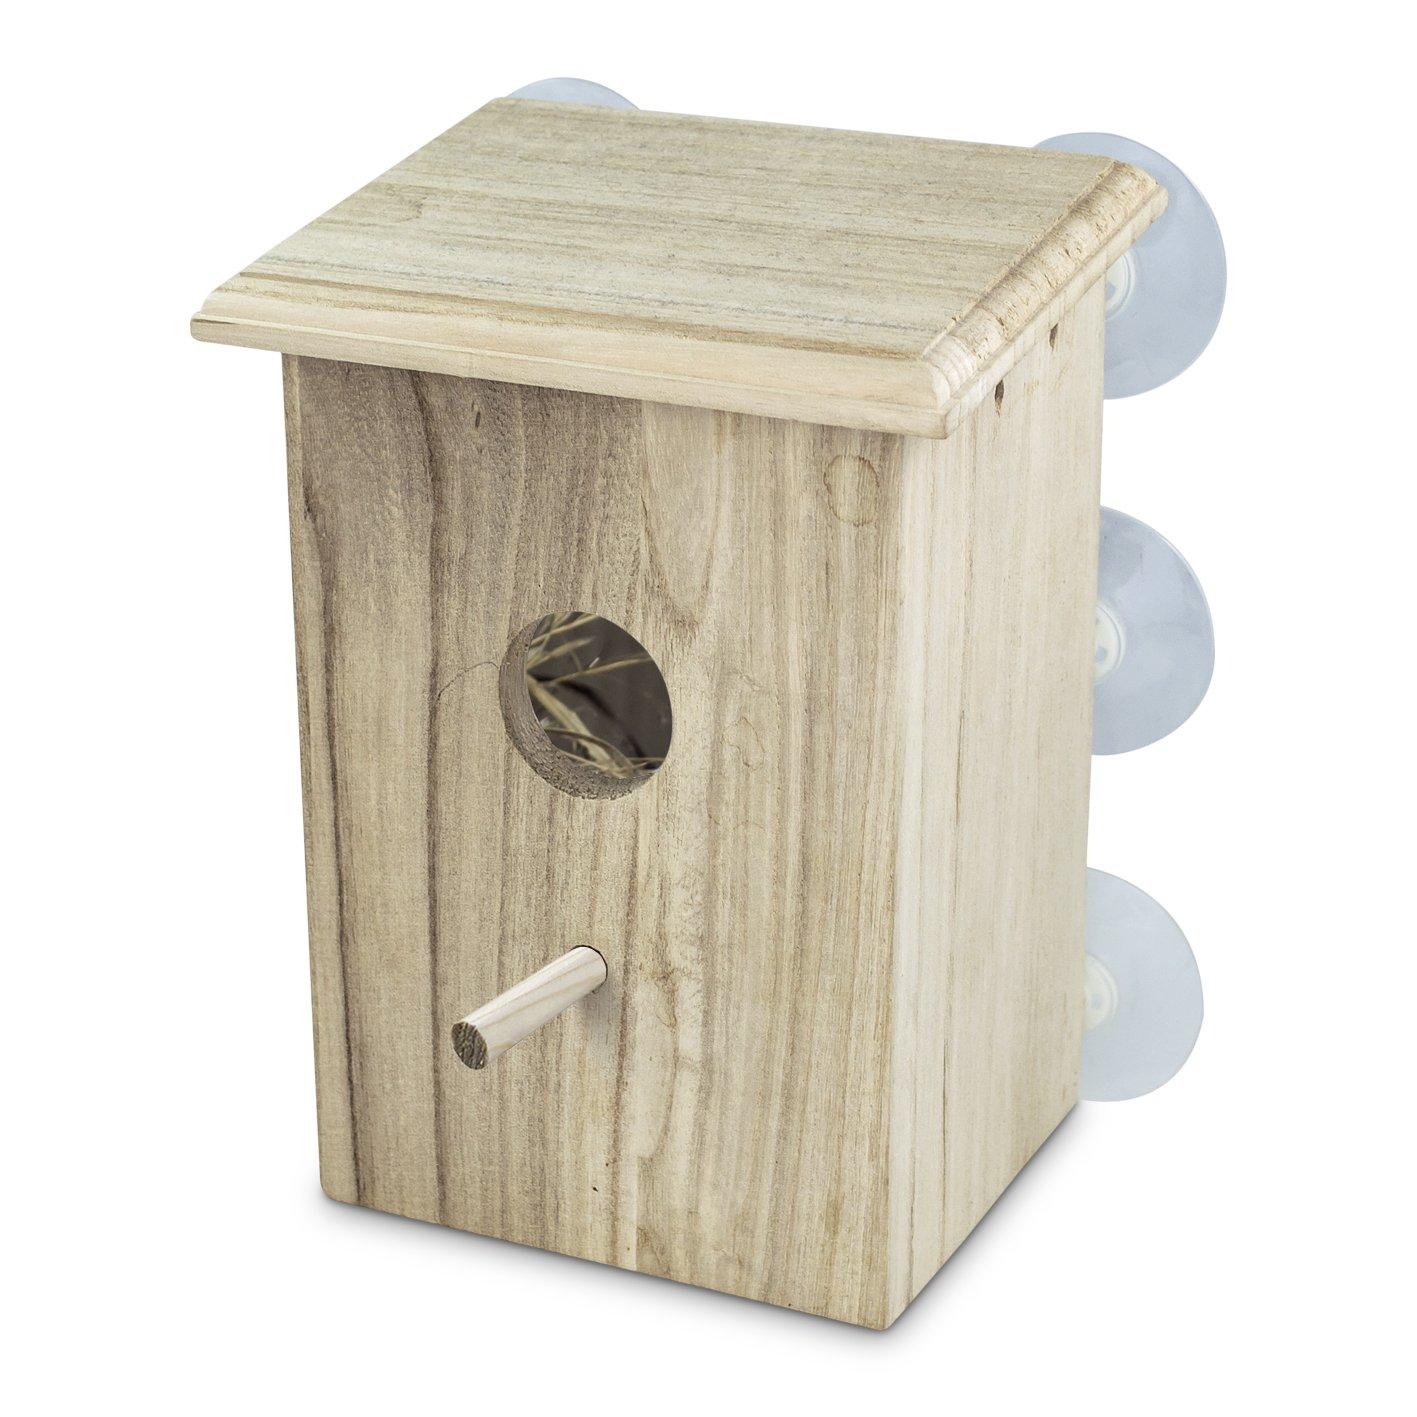 Window bird house - Petsn All Real Wood Bird Nest Window Bird House